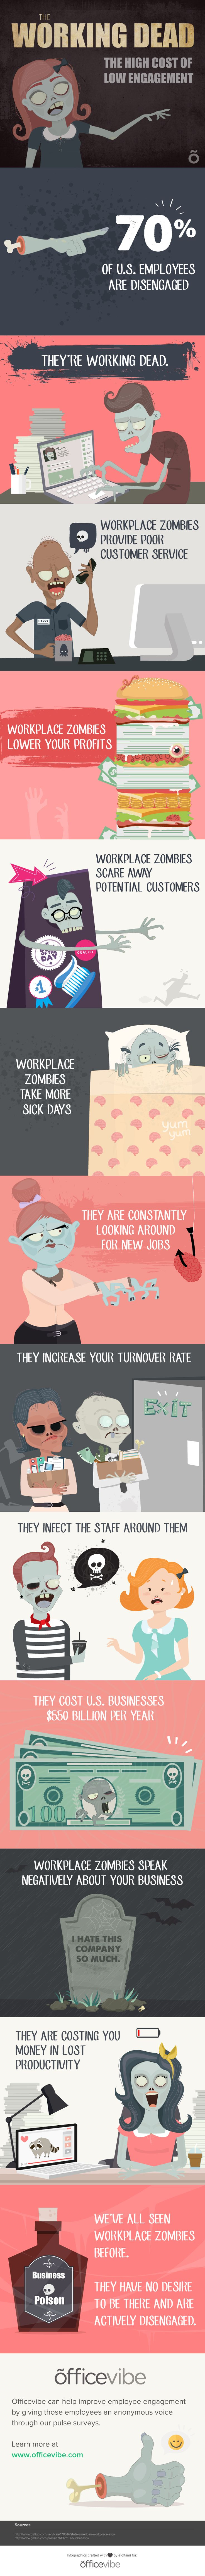 How Poor Management Creates Zombie Employees (Infographic)